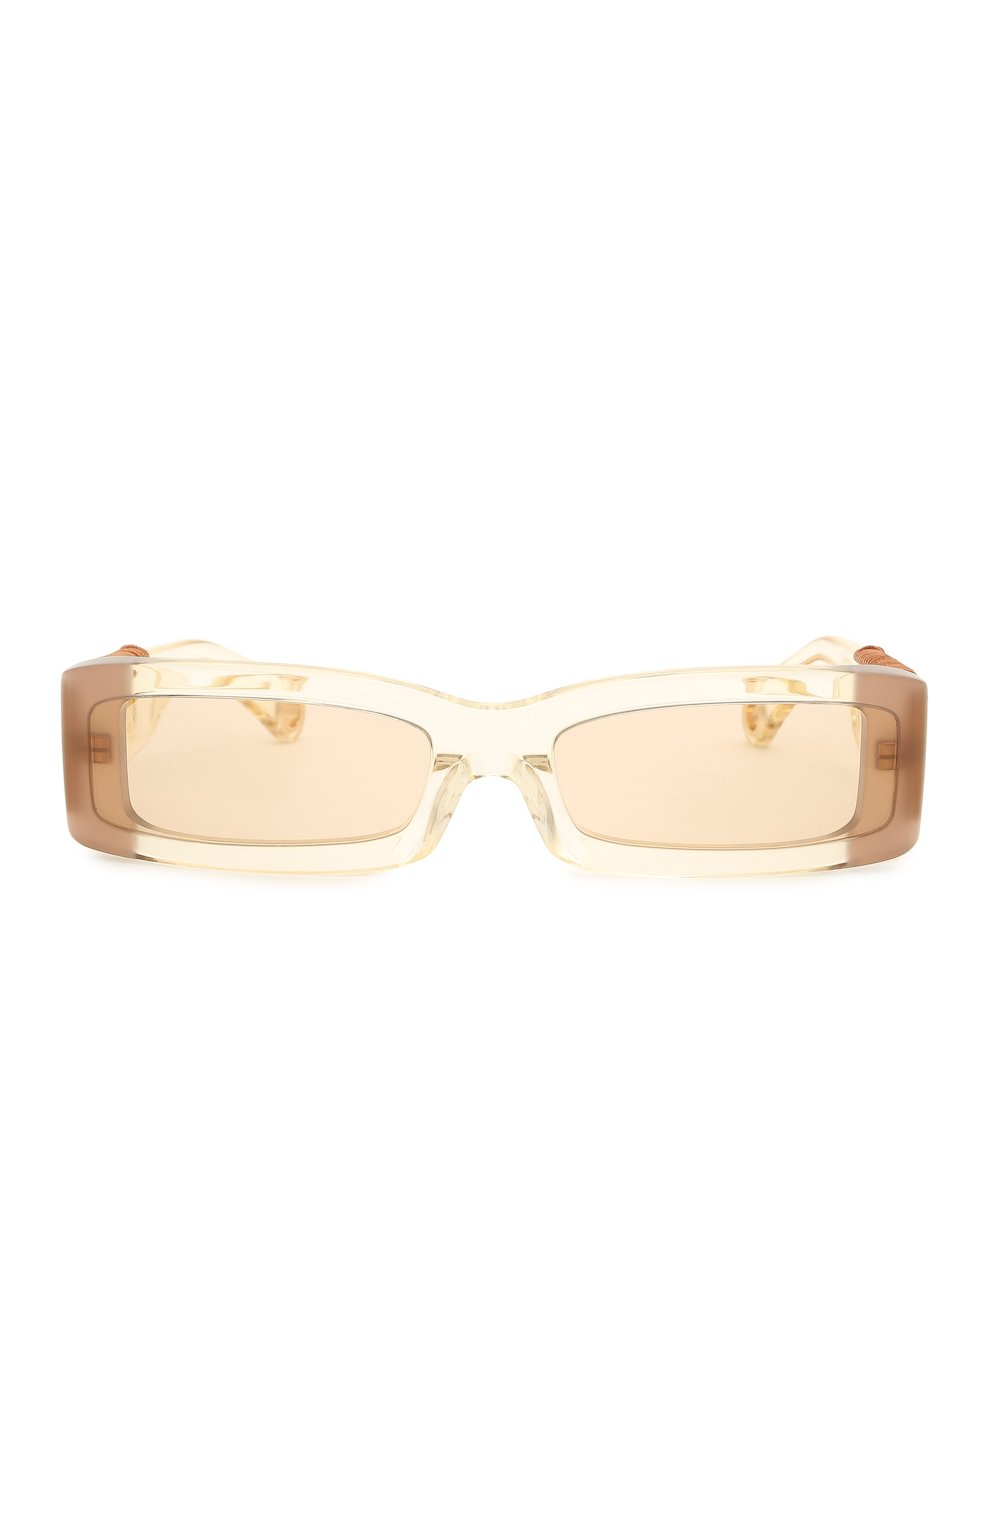 Женские солнцезащитные очки JACQUEMUS бежевого цвета, арт. LES LUNETTES 97 YELL0W | Фото 4